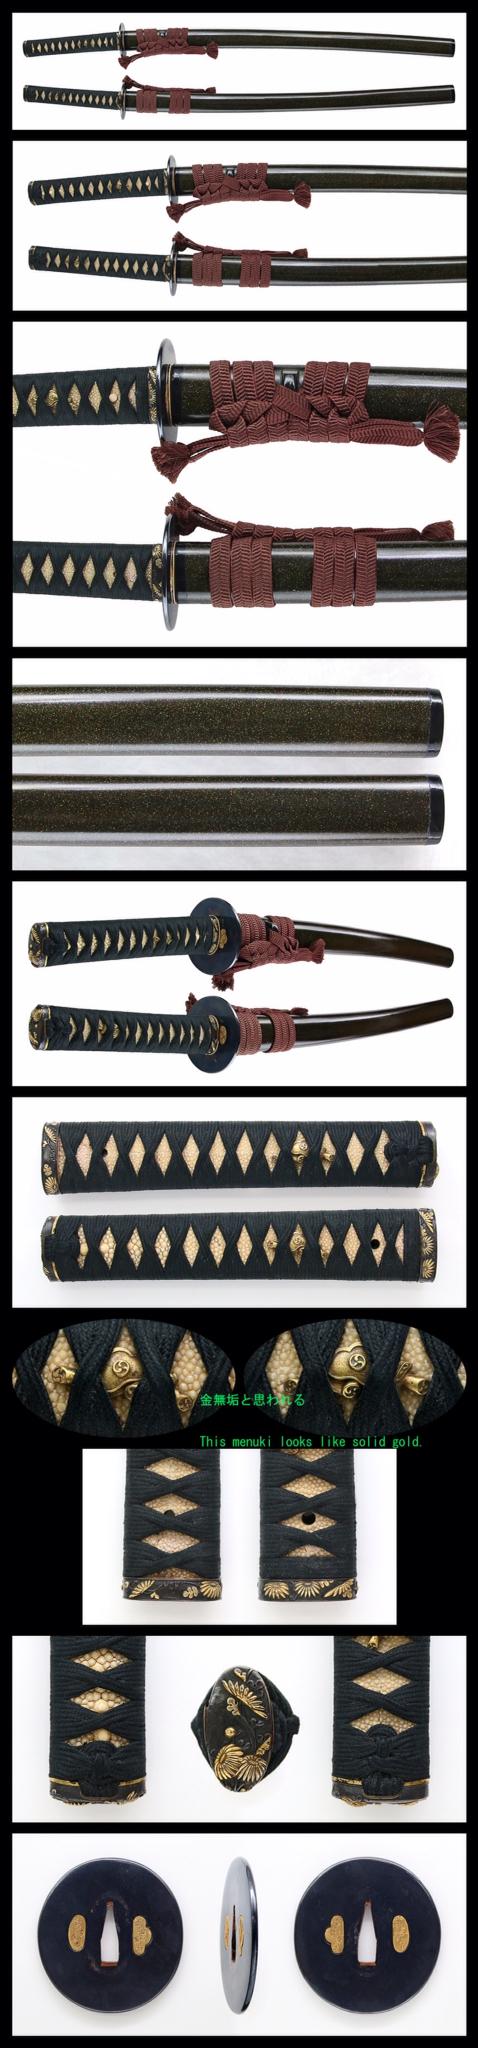 The most recent addition to my collection Katana : Yamato kami Yoshimichi